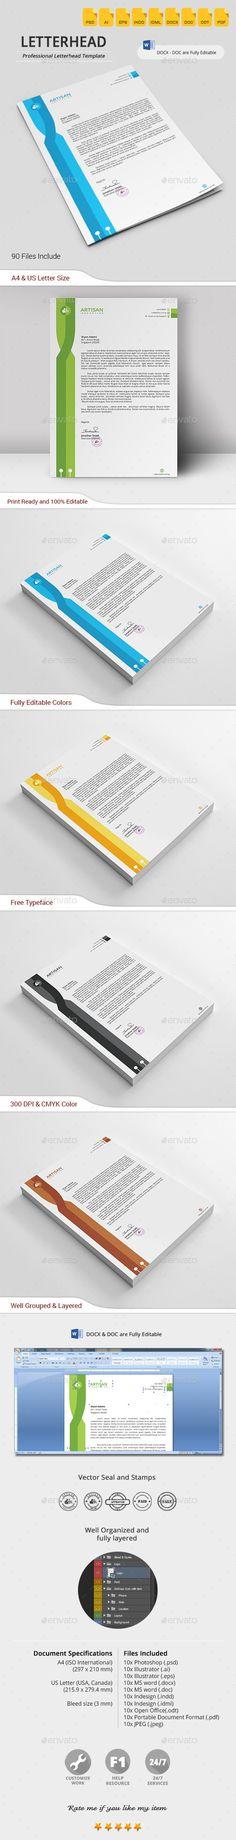 #Letterhead - #Stationery #Print #Templates Download here: https://graphicriver.net/item/letterhead/10196940?ref=alena994